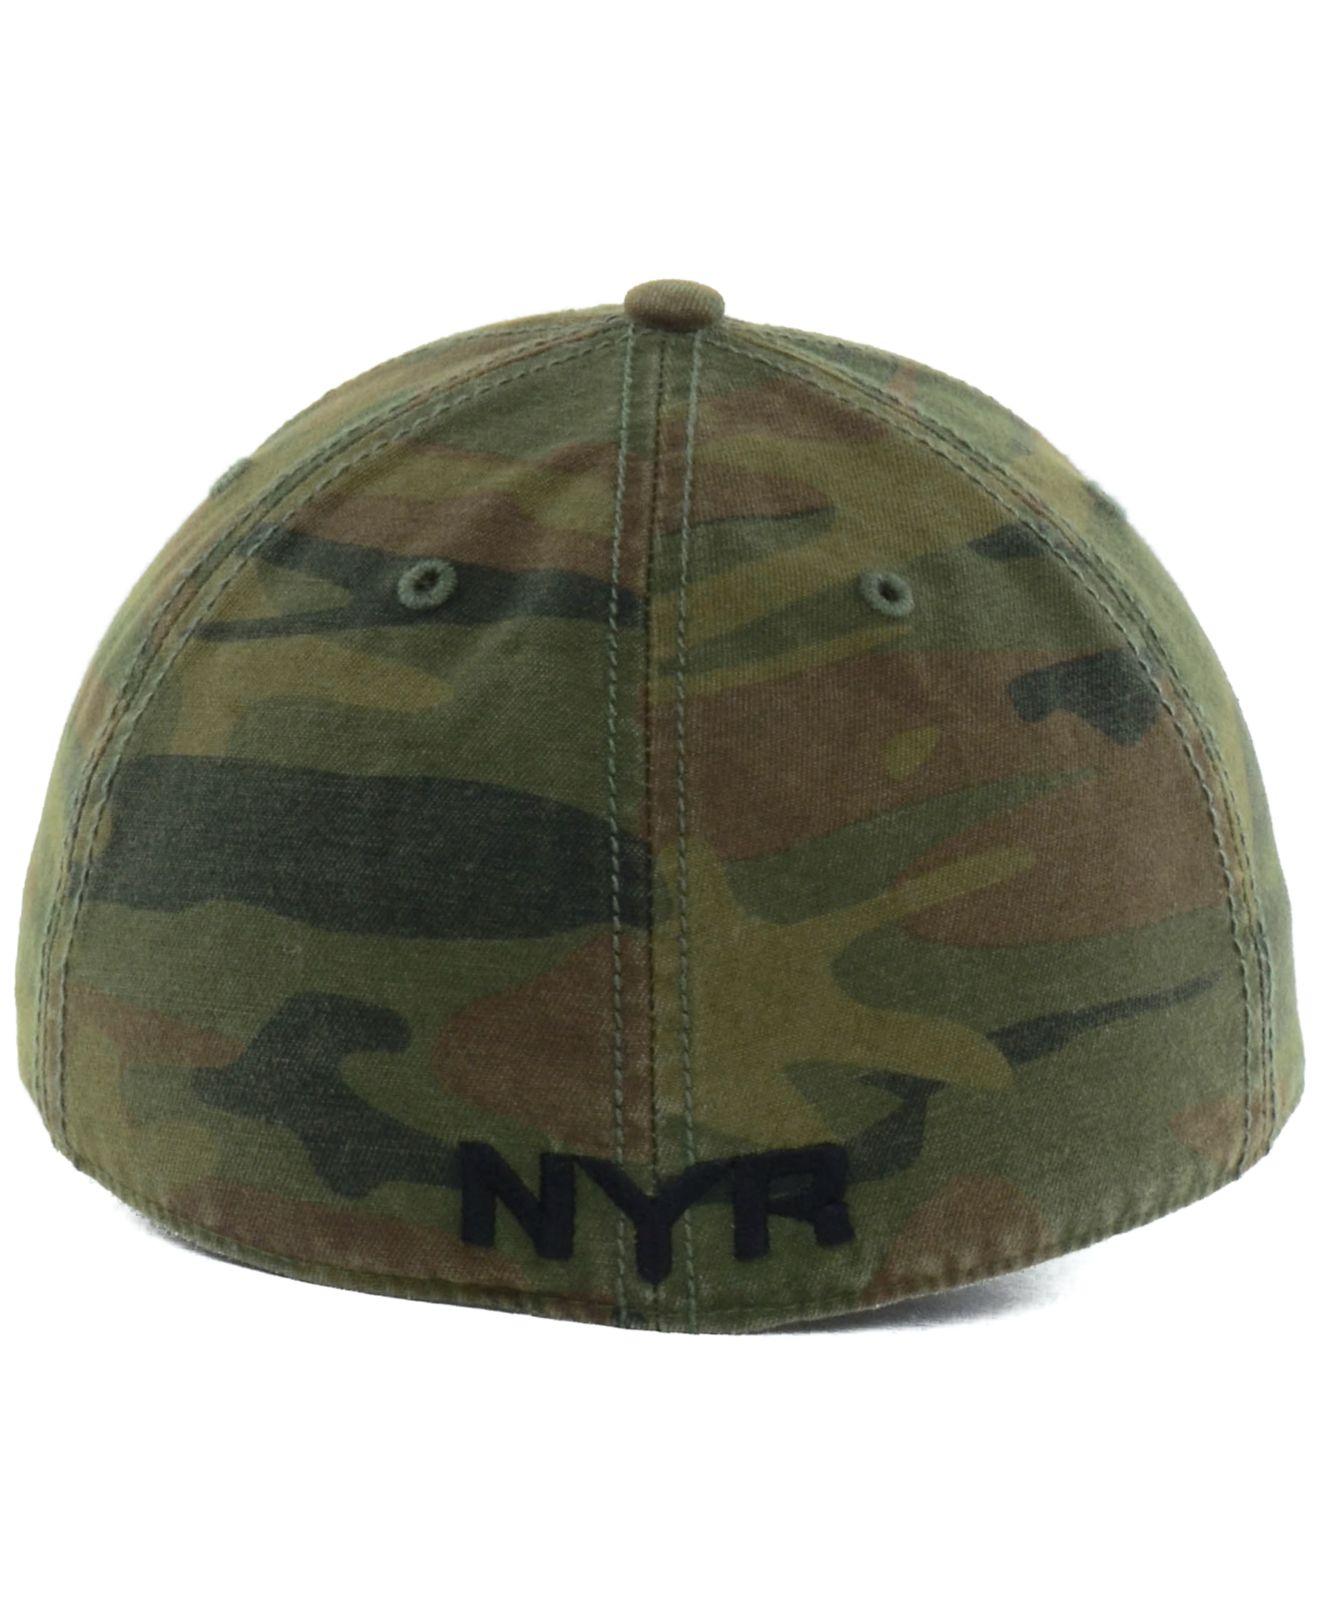 classic fit 14136 66ef0 switzerland lyst 47 brand new york rangers movement cap in green for men  90012 4871c